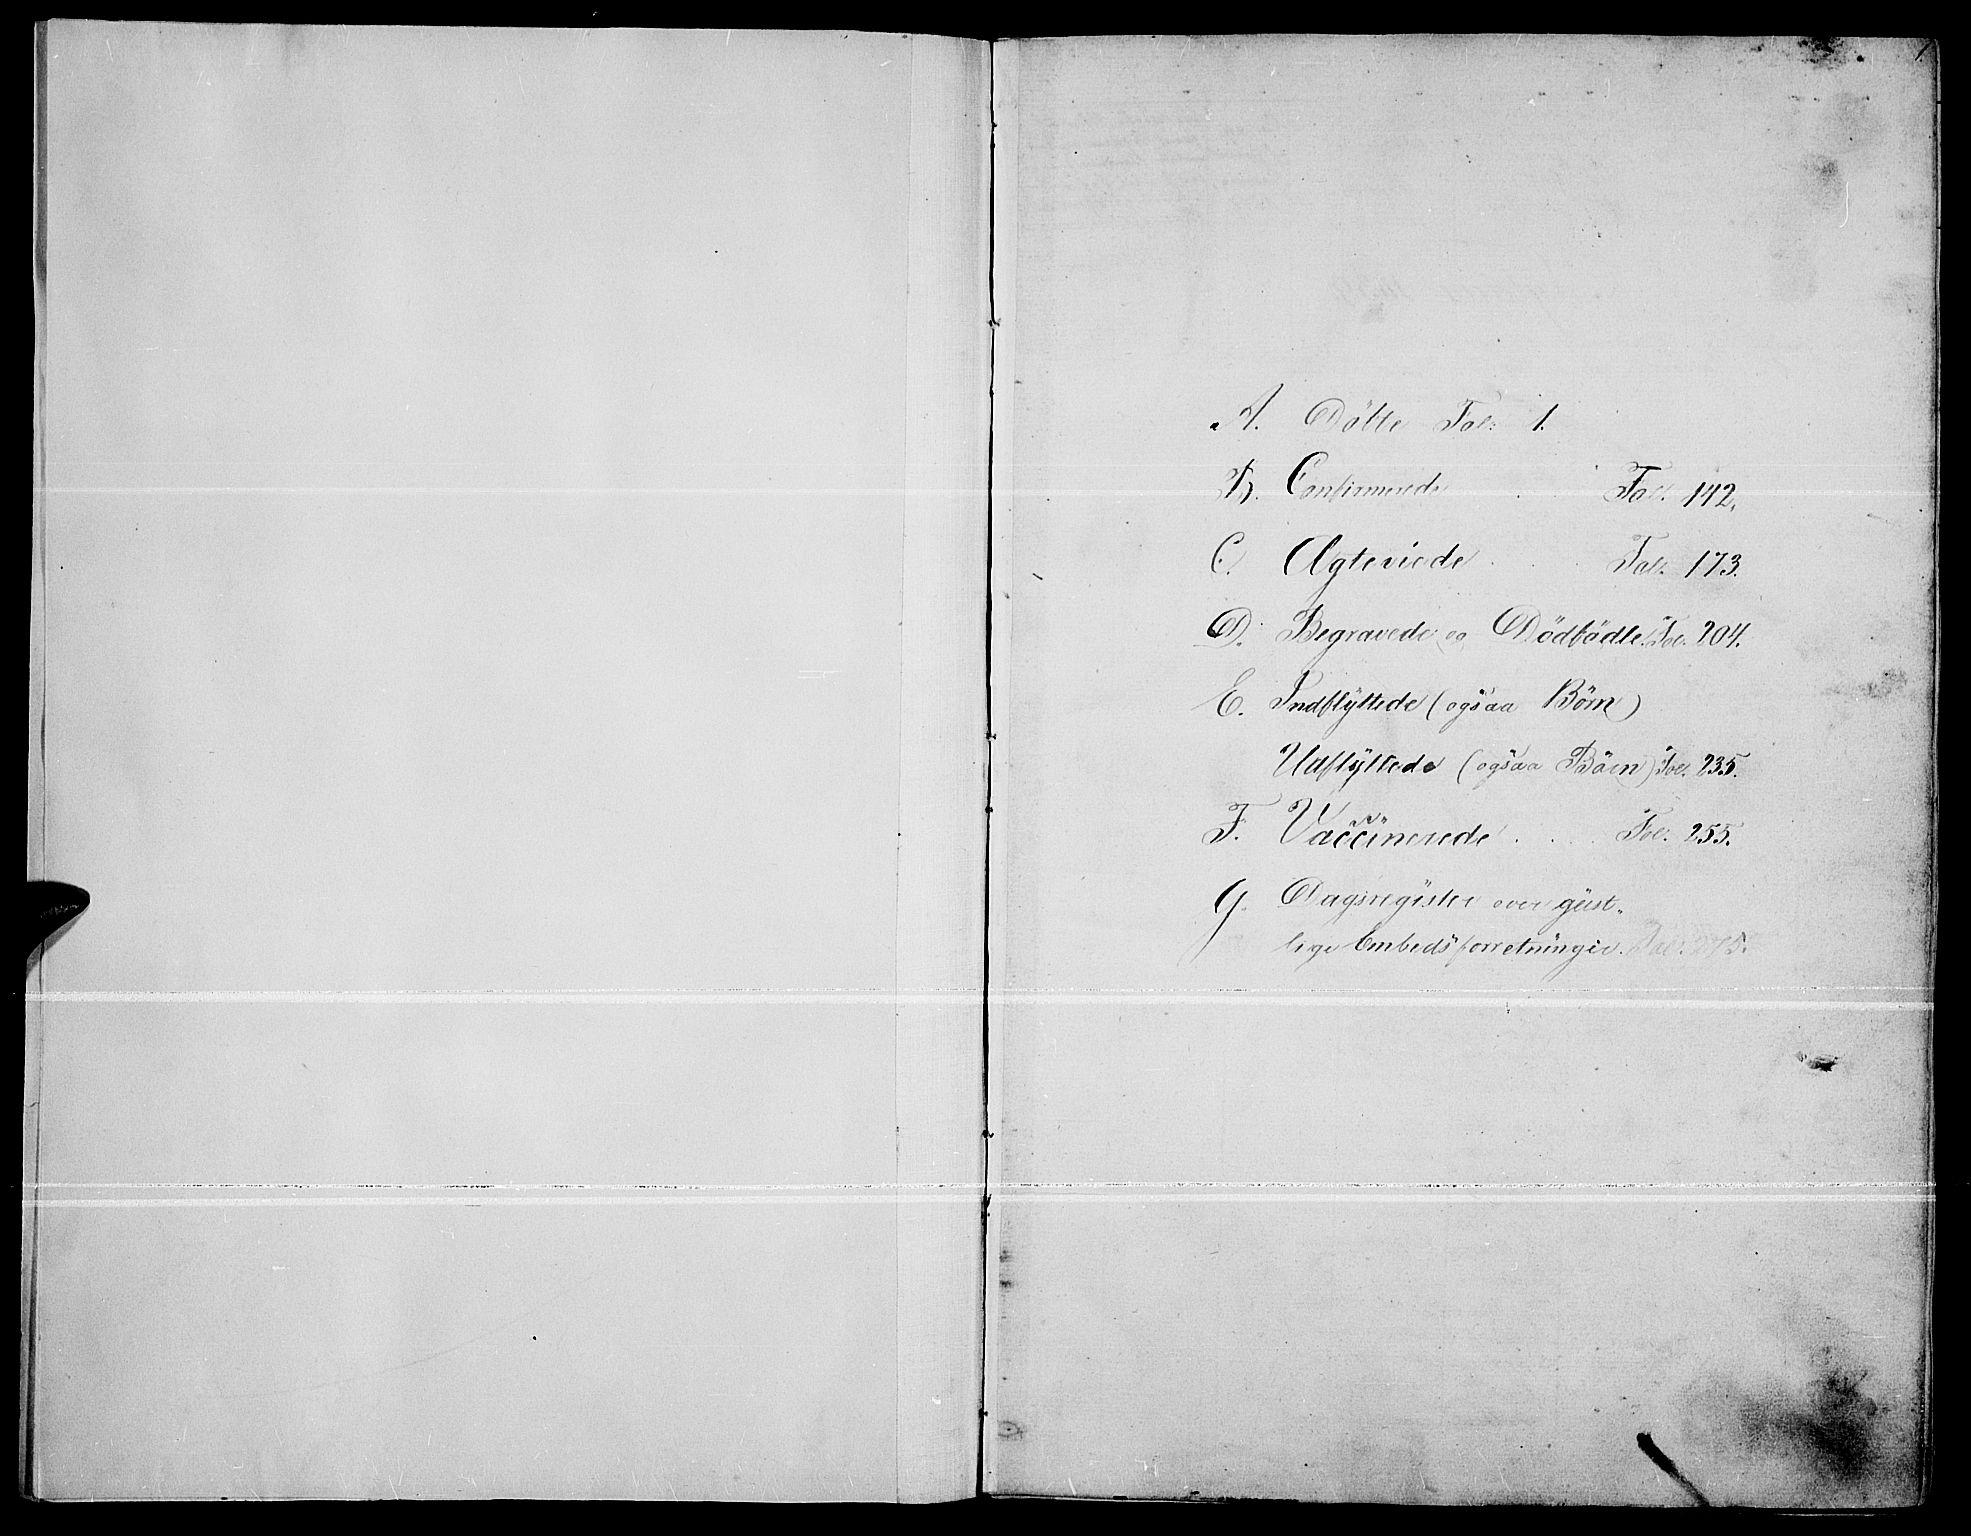 SAH, Fron prestekontor, H/Ha/Haa/L0004: Ministerialbok nr. 4, 1839-1848, s. 1